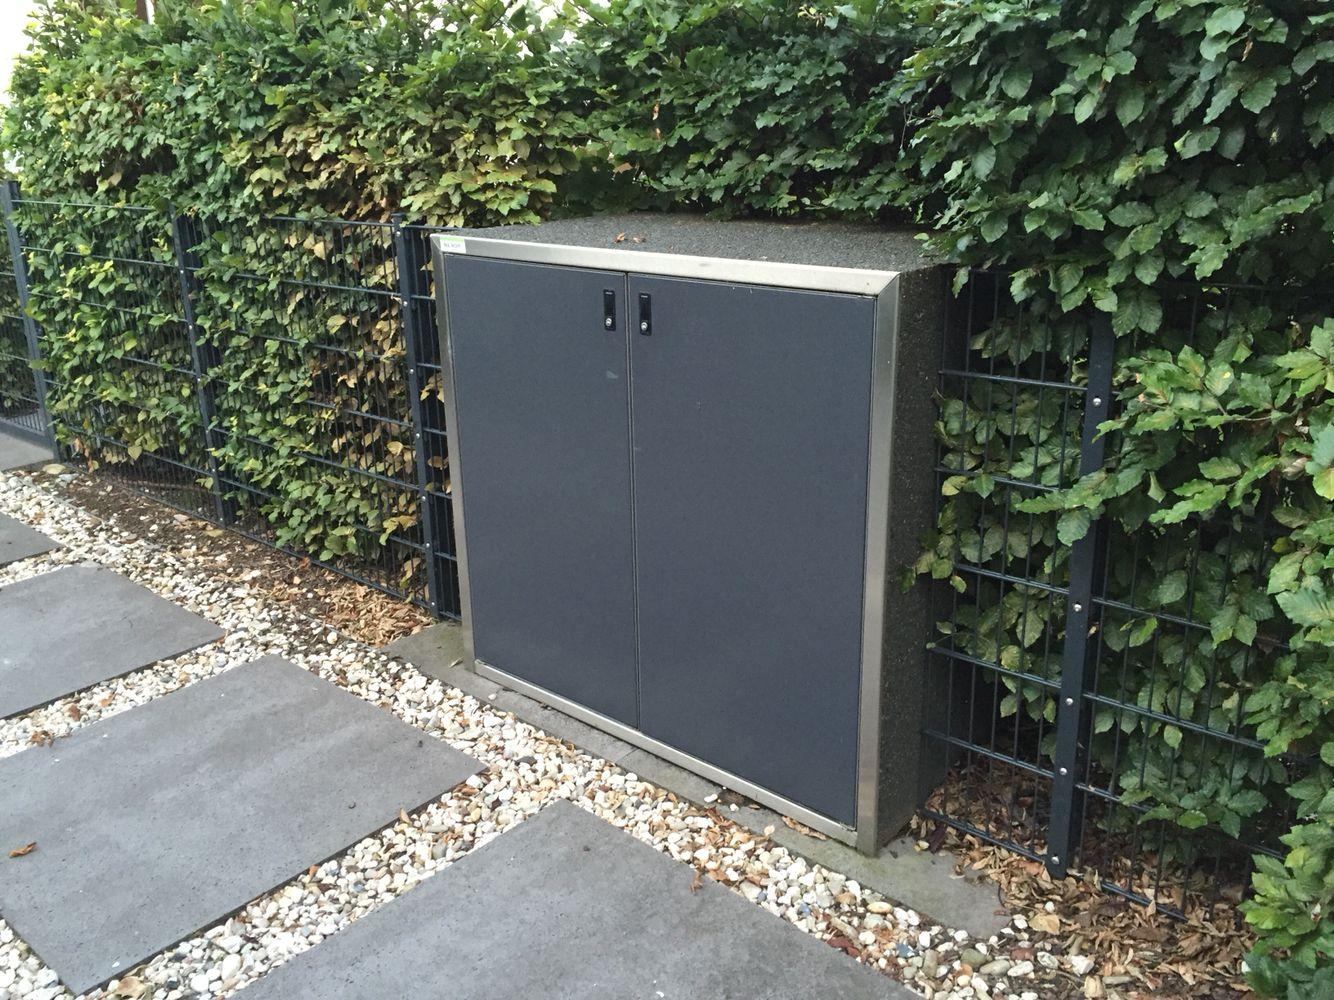 m lltonnenbox silent 243 t ren anthrazit rahmen edelstahl korpus perlmutt schwarz weisse. Black Bedroom Furniture Sets. Home Design Ideas